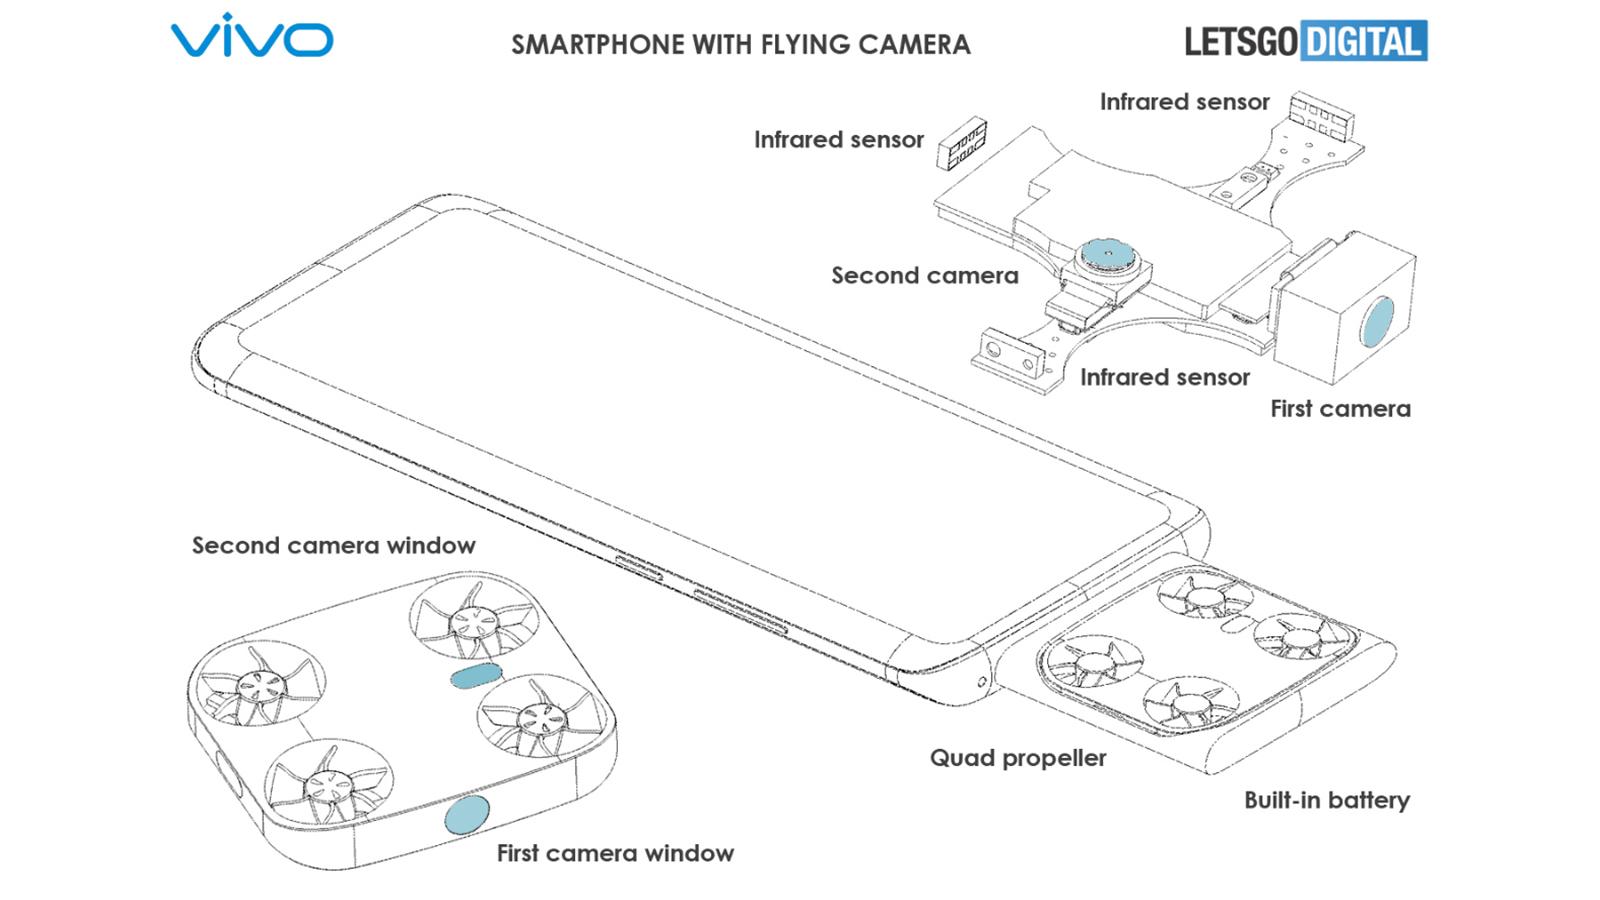 Vivo camera drone